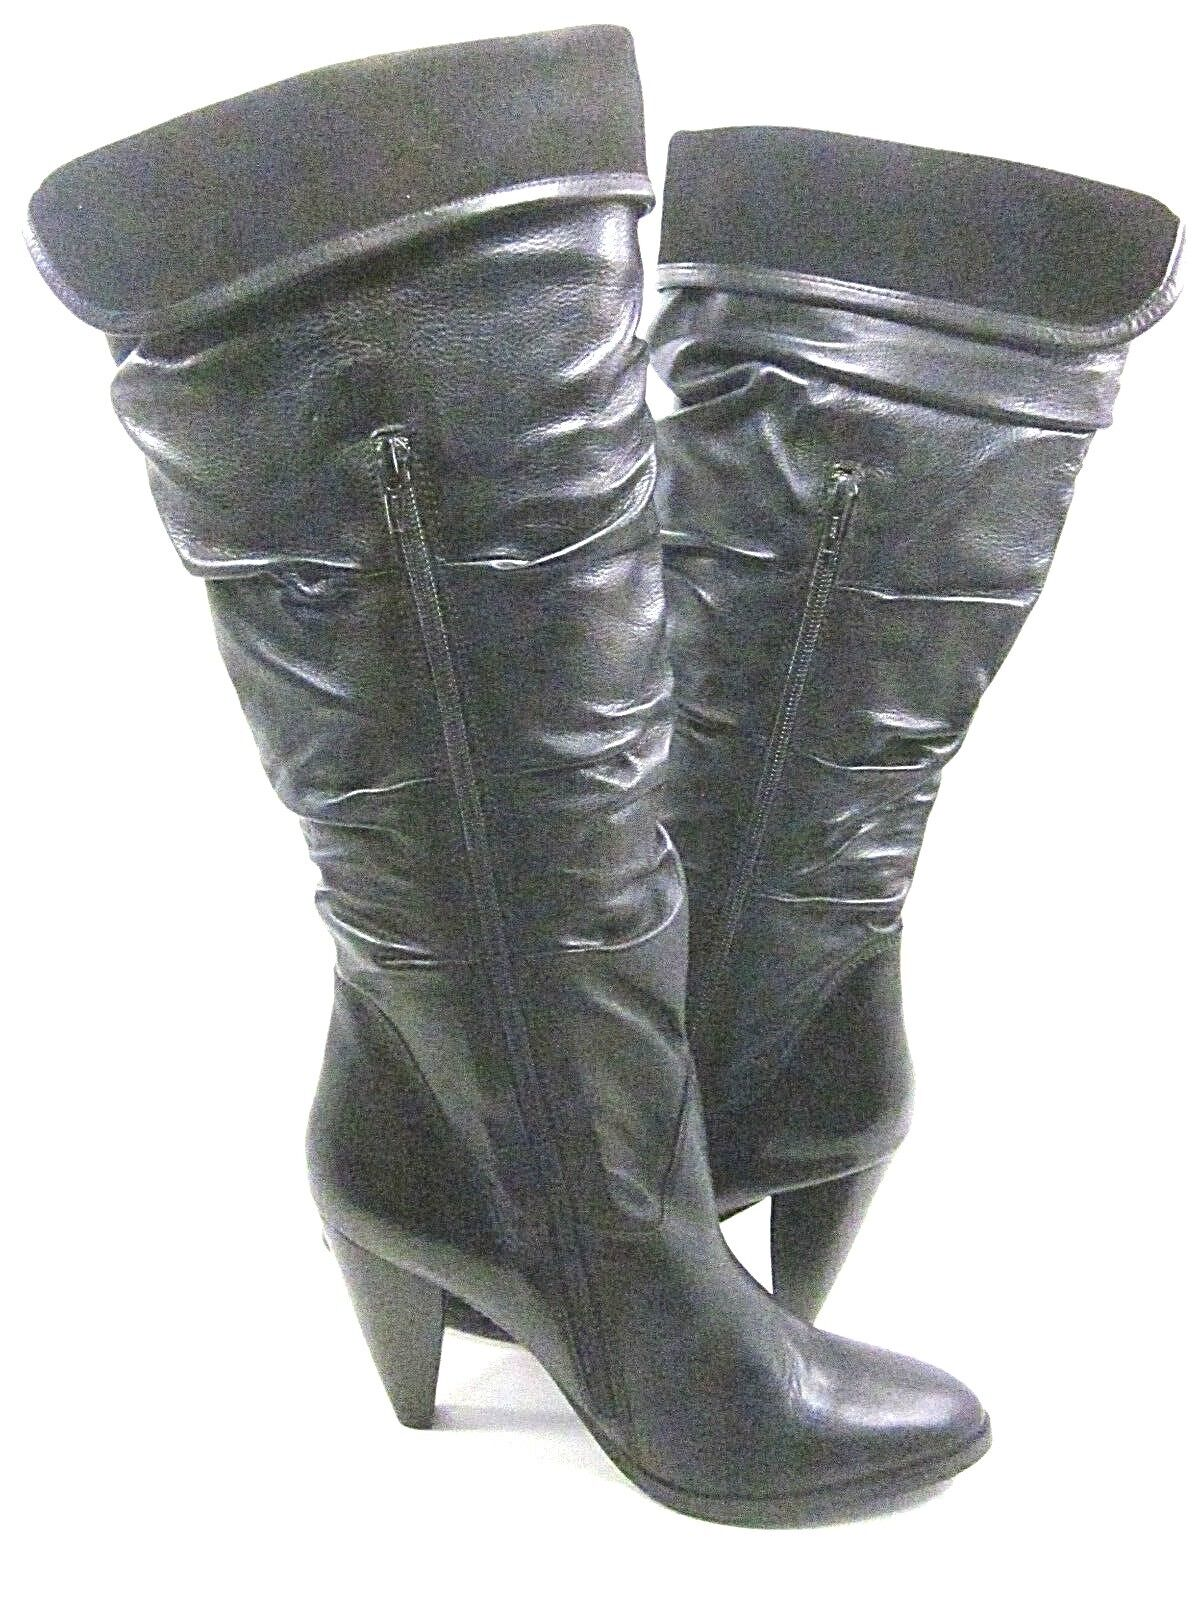 DIBA, ALVA VIDA BOOT, Damenschuhe, BLACK, DISPLAY US 10M, LEATHER, NEW/ DISPLAY BLACK, WITHOUT BOX 679ef2